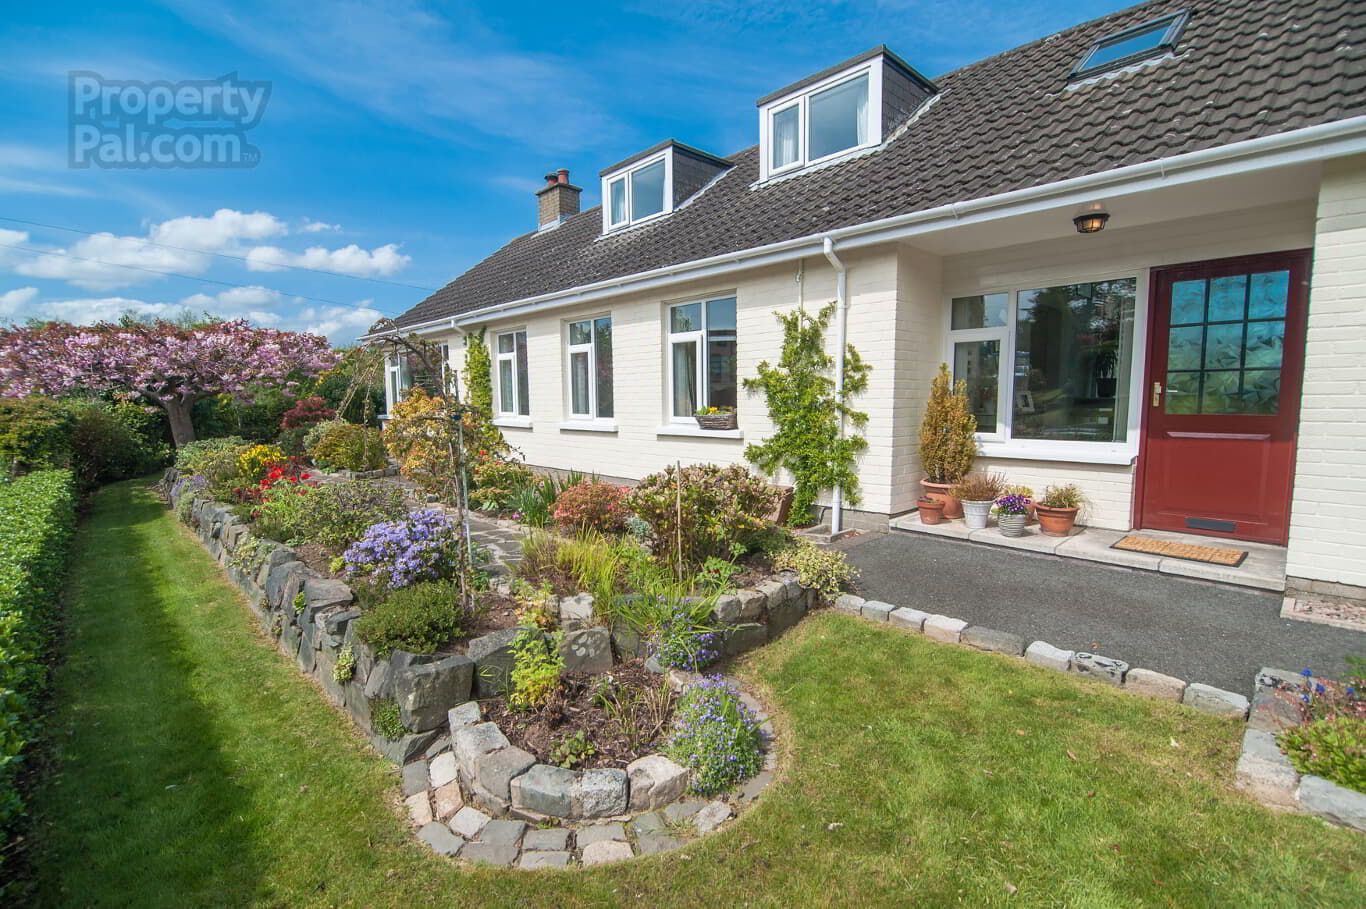 2a Marmont Park Belfast Small Garden Design Belfast Garden Design